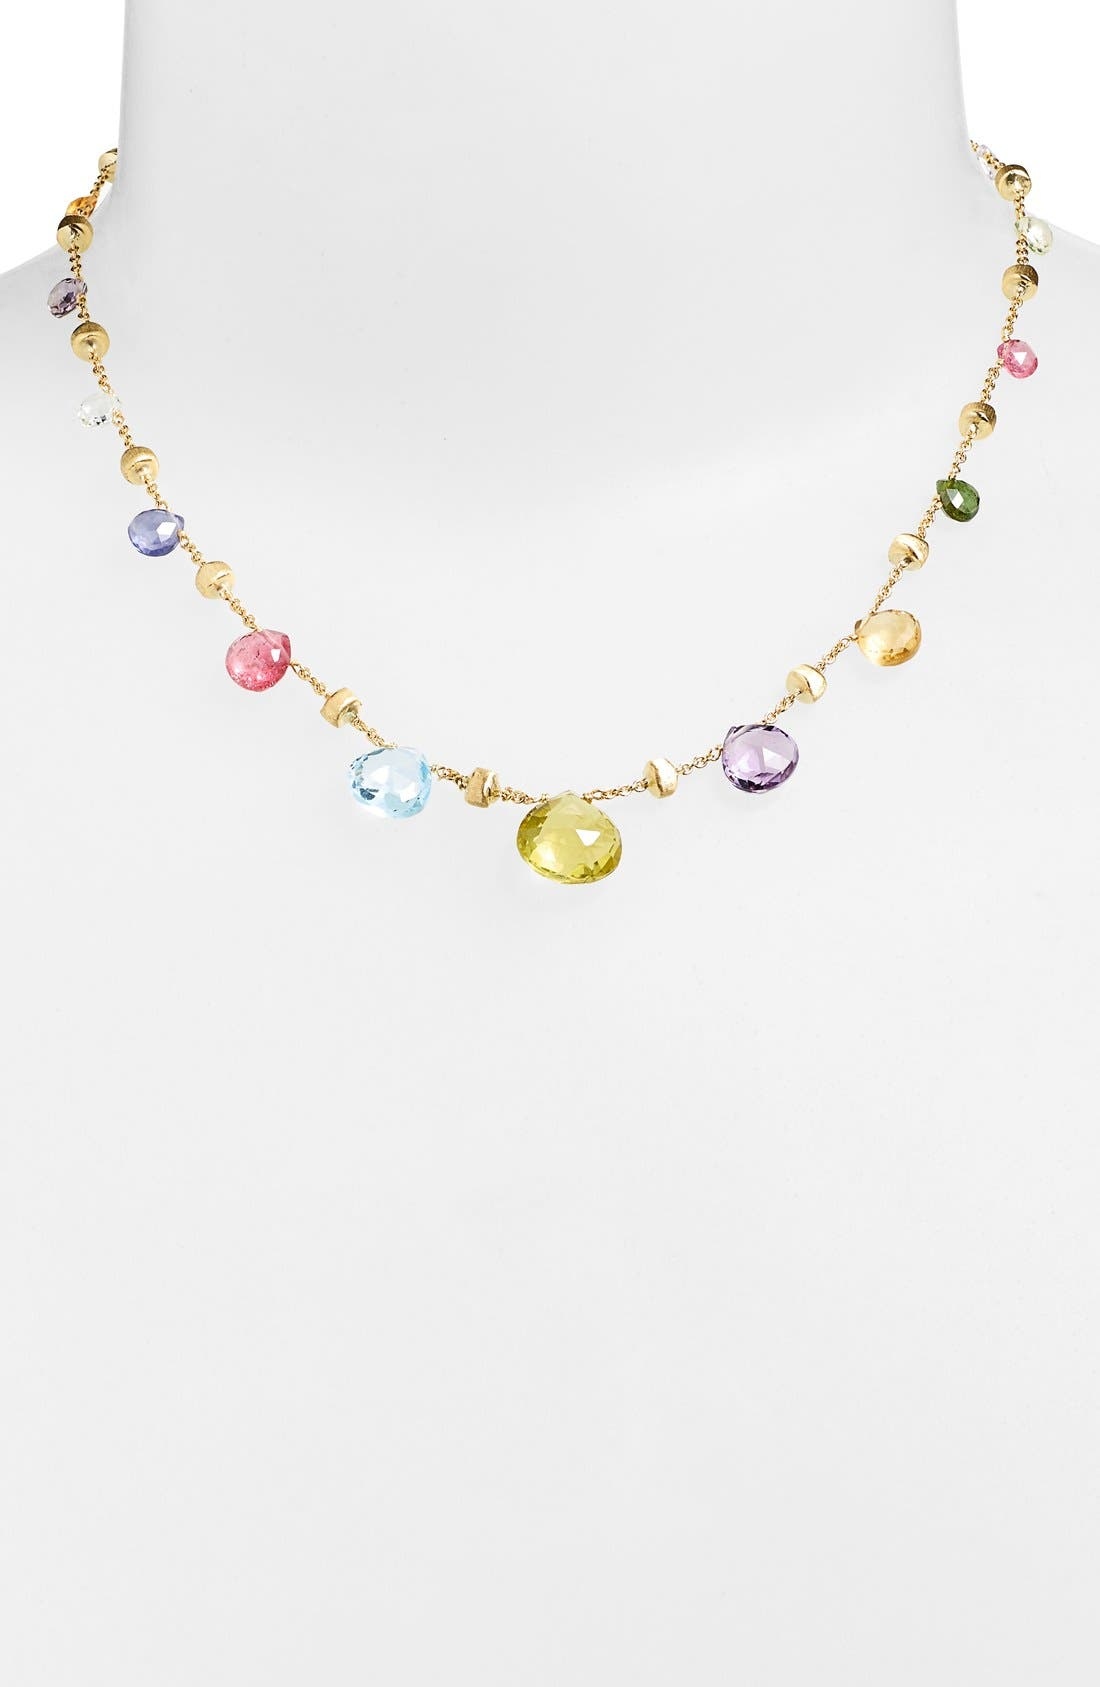 Main Image - Marco Bicego 'Paradise' Collar Necklace